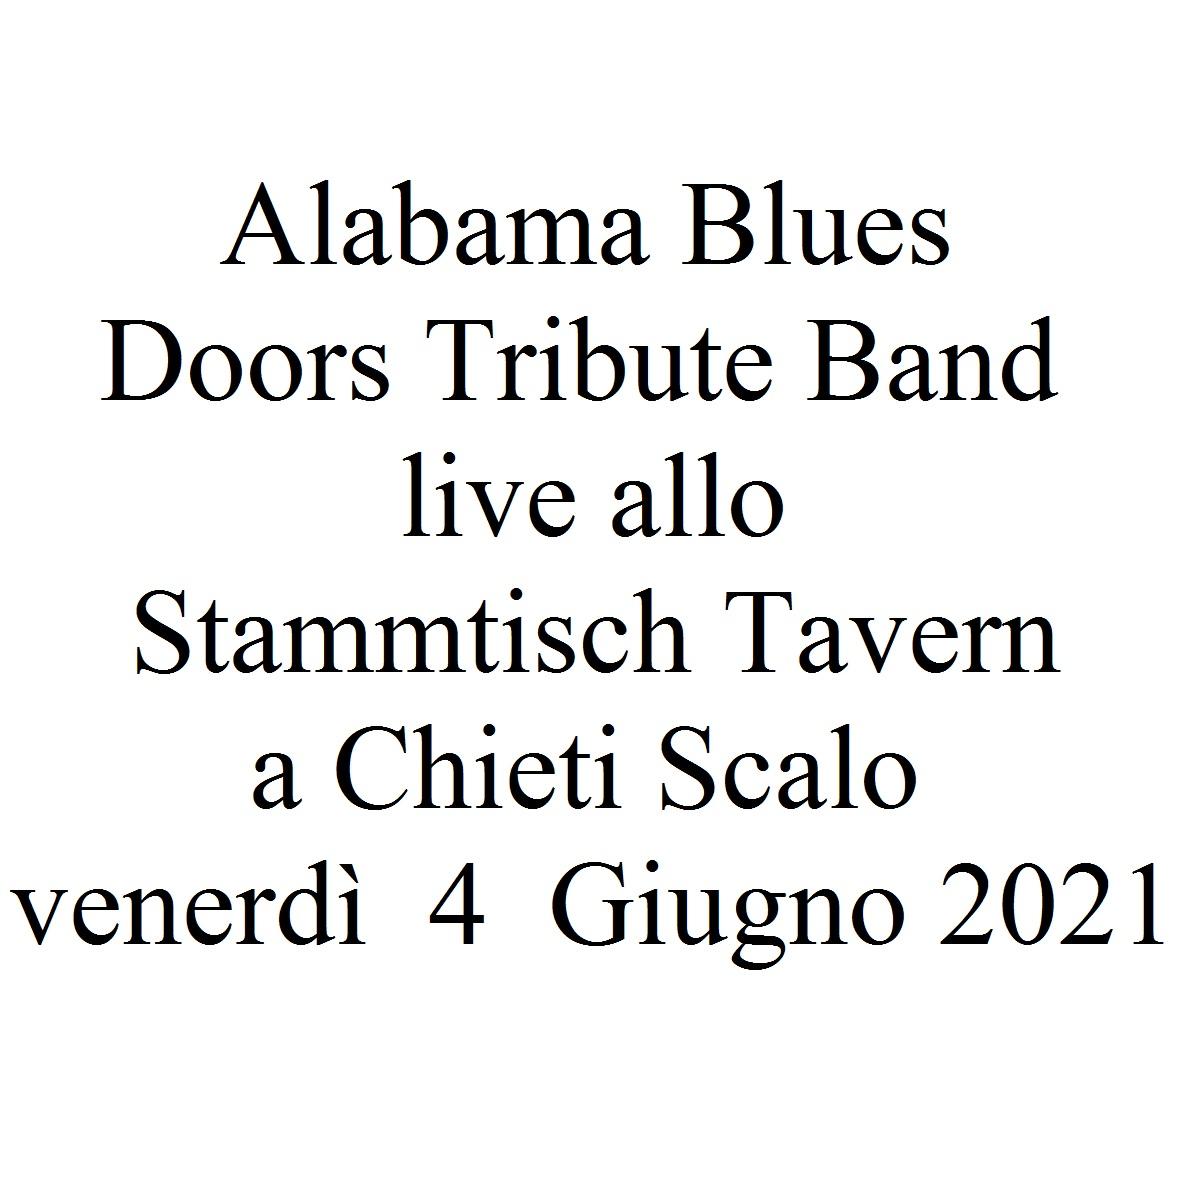 Alabama Blues Doors Tribute Band live 4 Giugno 2021 foto